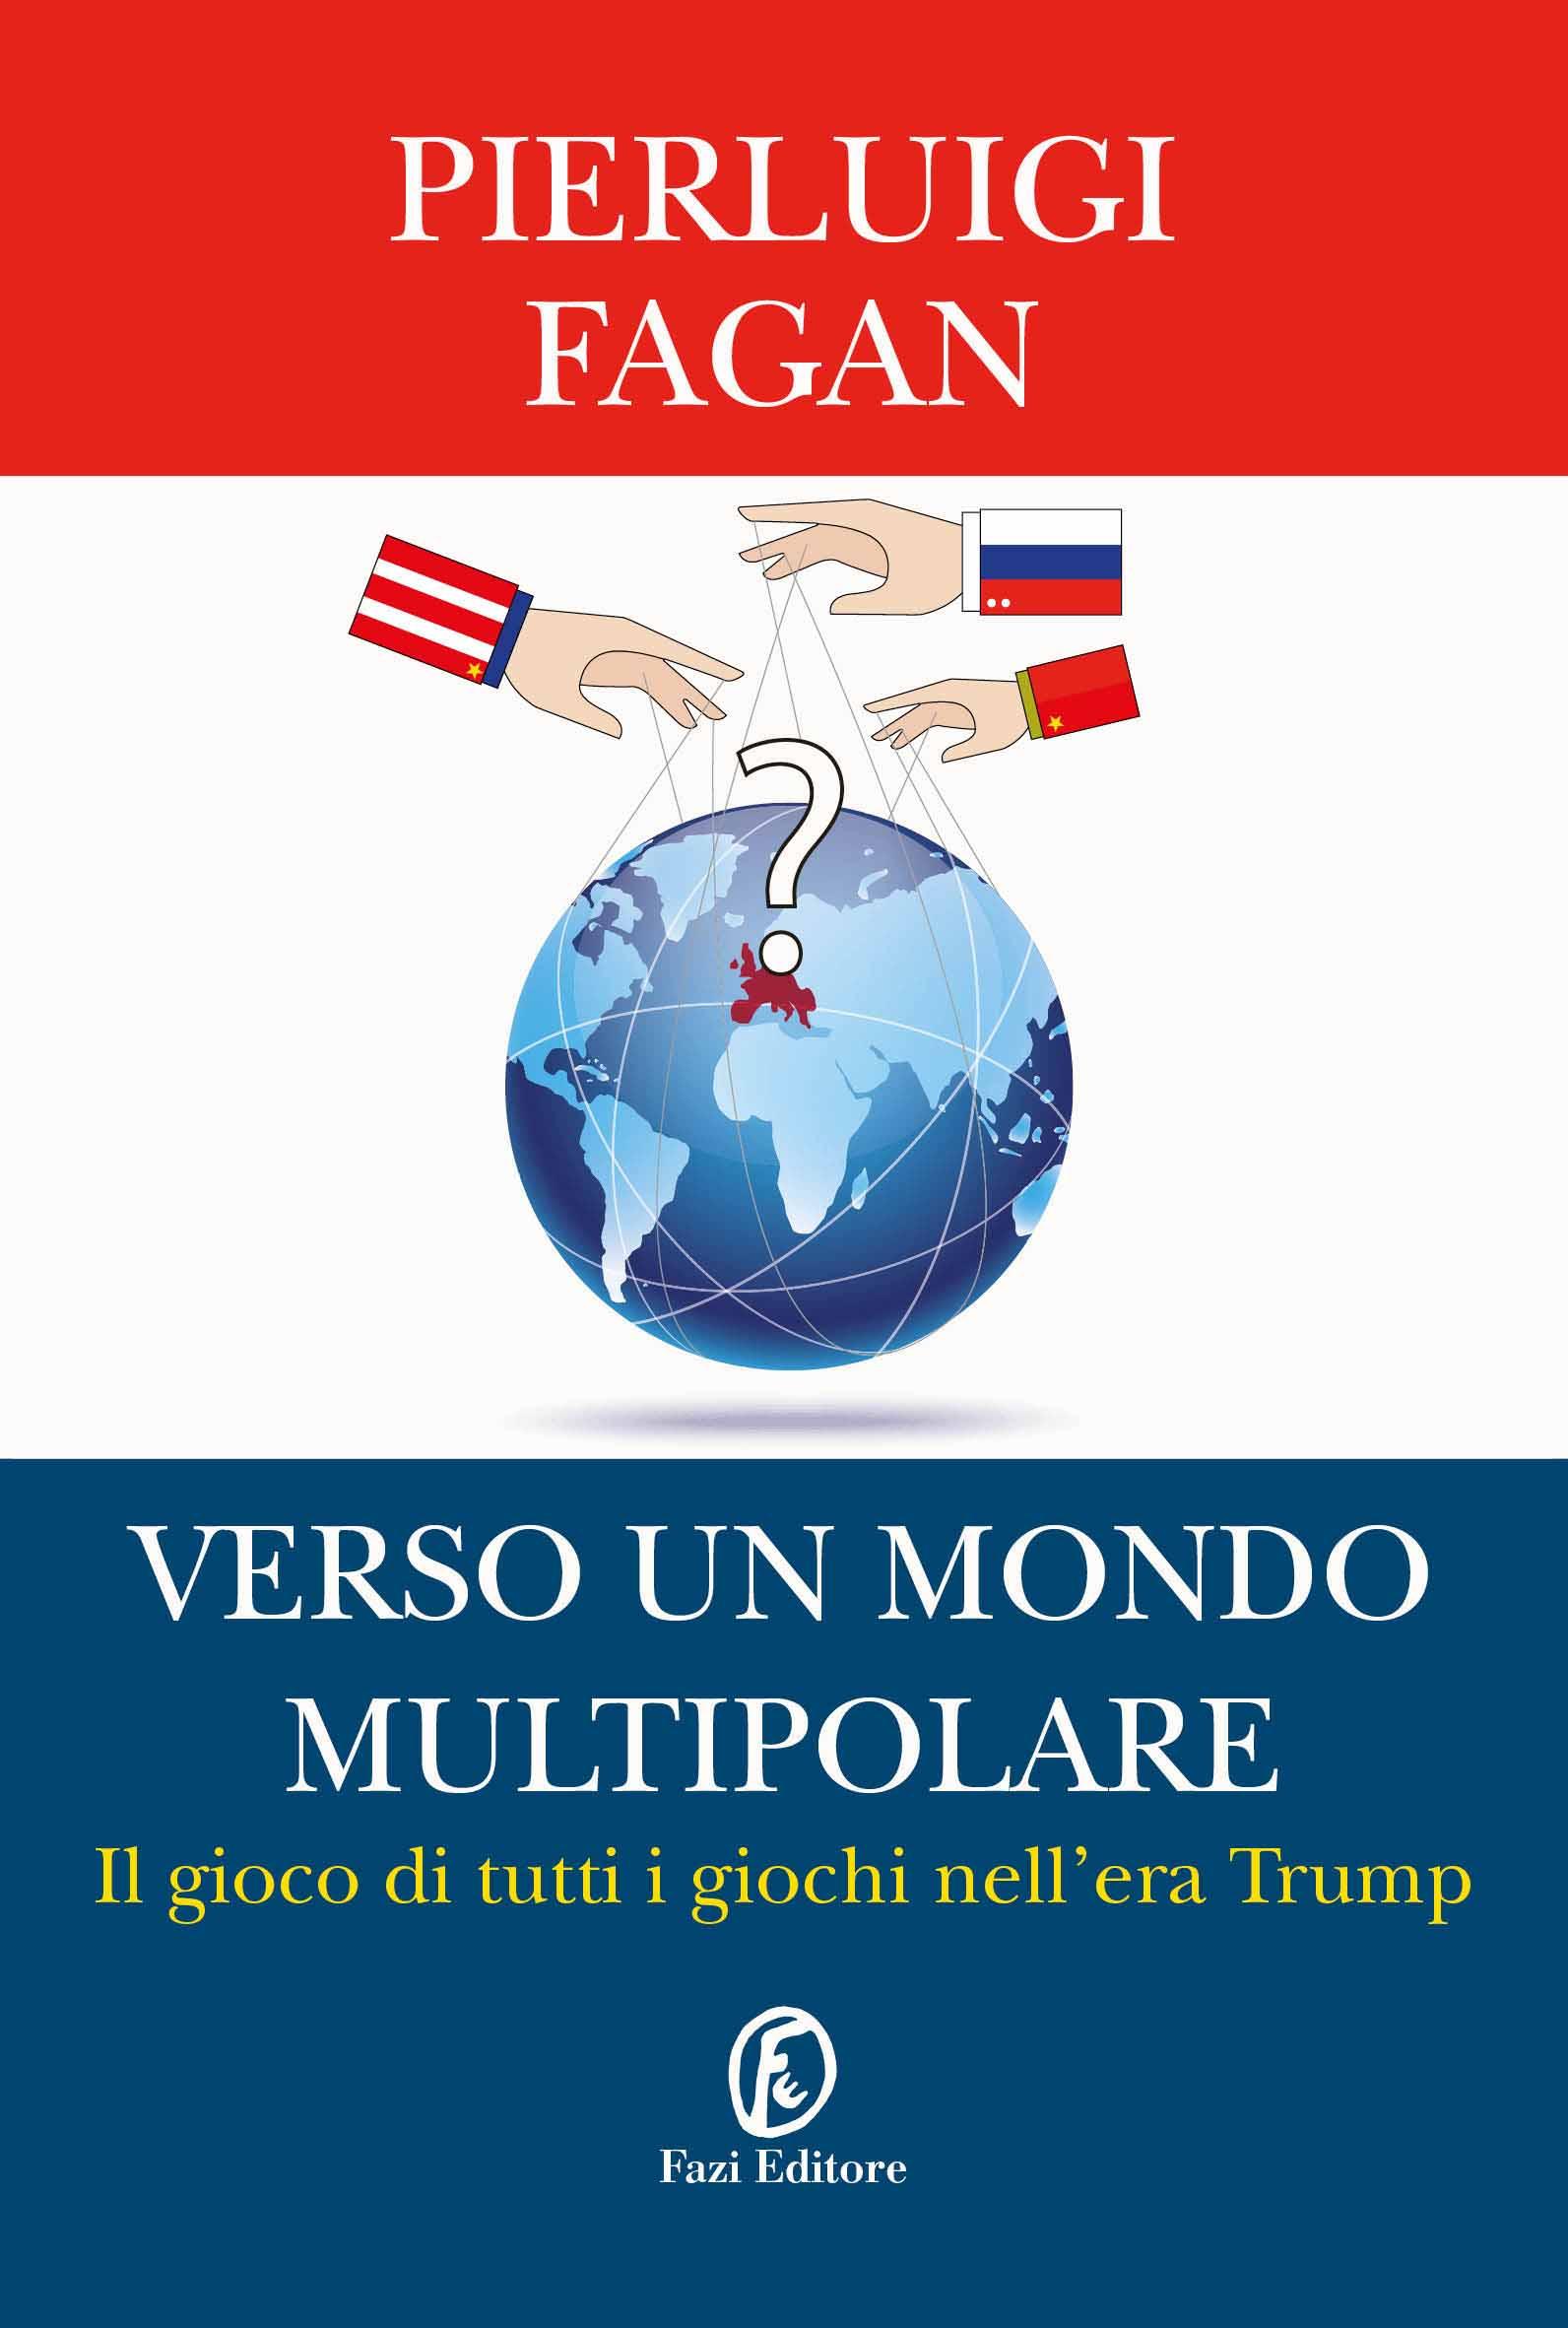 verso un mondo multipolare